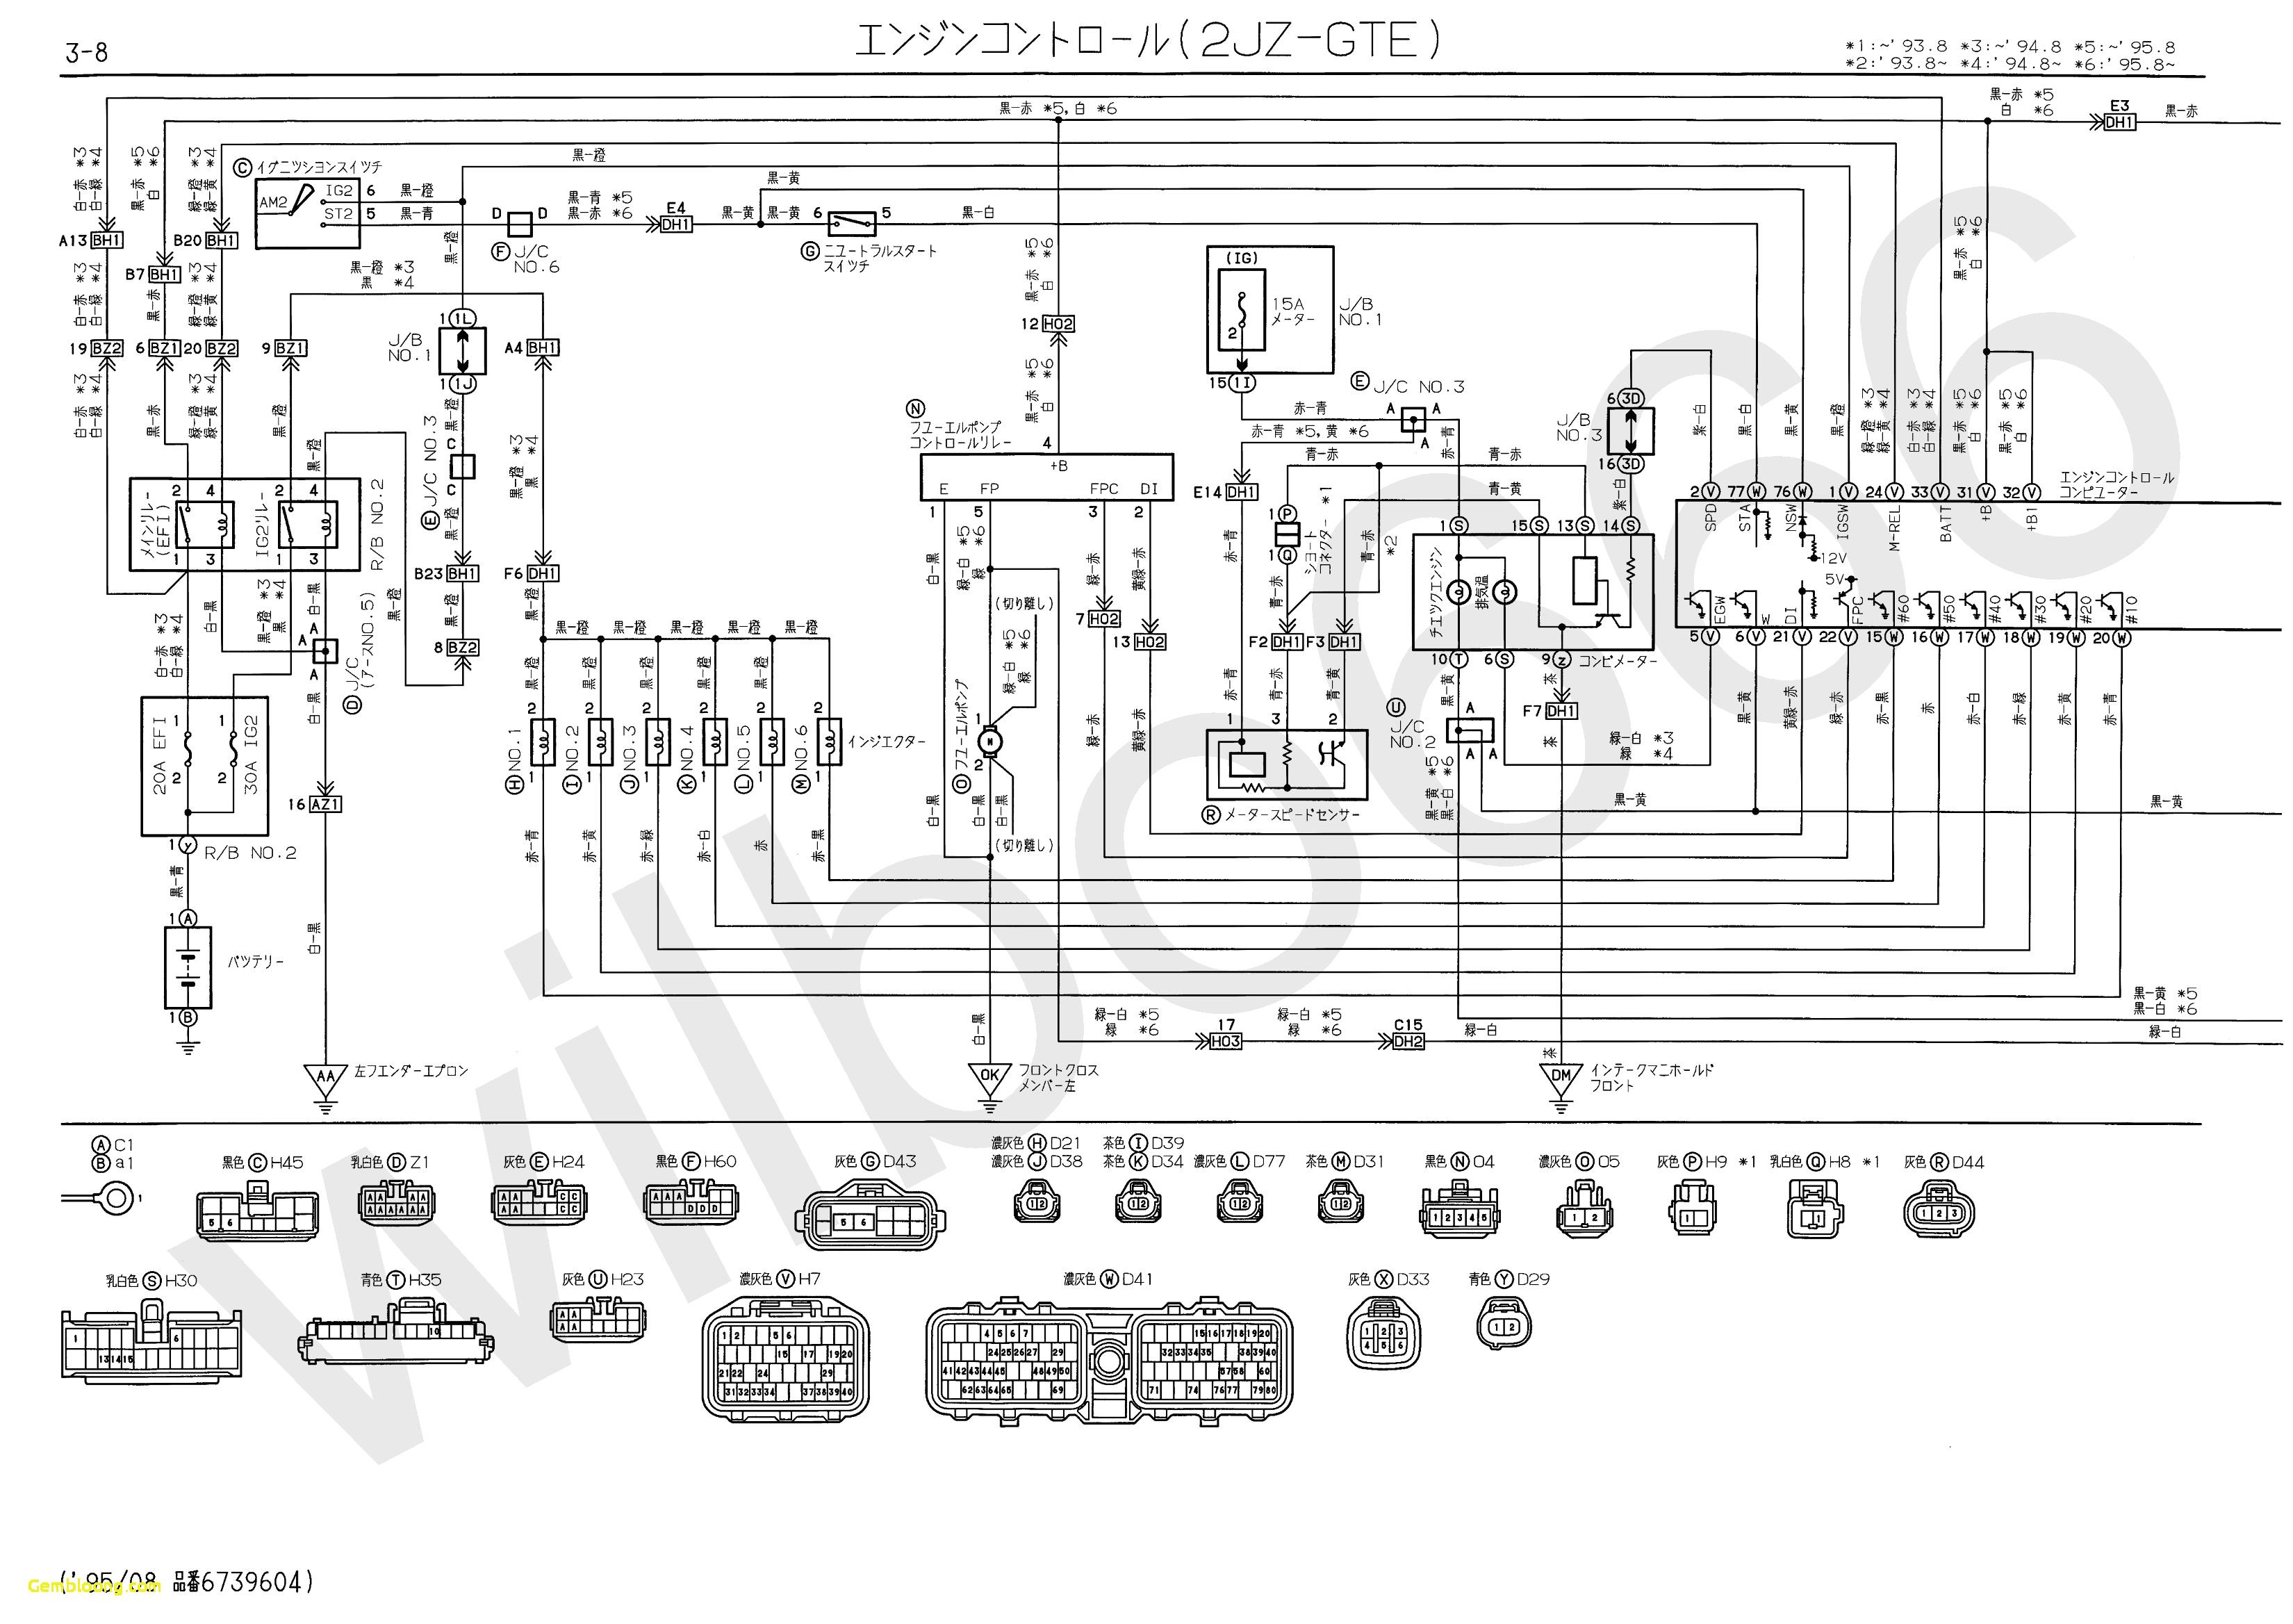 bmw wiring system diagram wiring diagram page bmw wiring diagram system wds version 15 bmw wiring diagram system